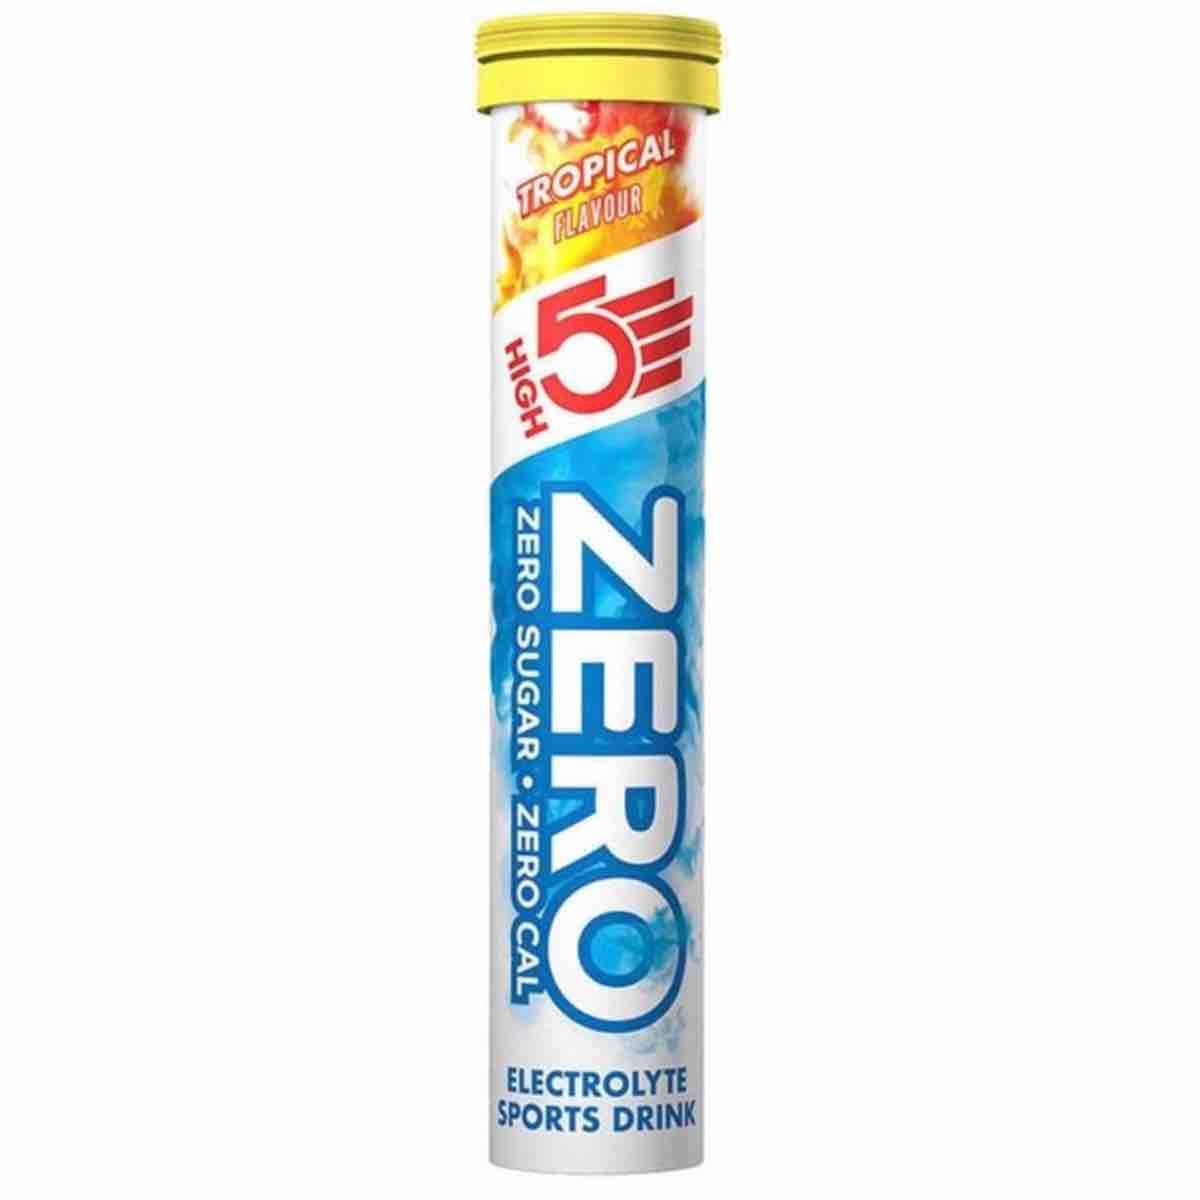 High5 Zero Blackcurrant Brusetabletter | electrolytes tabs